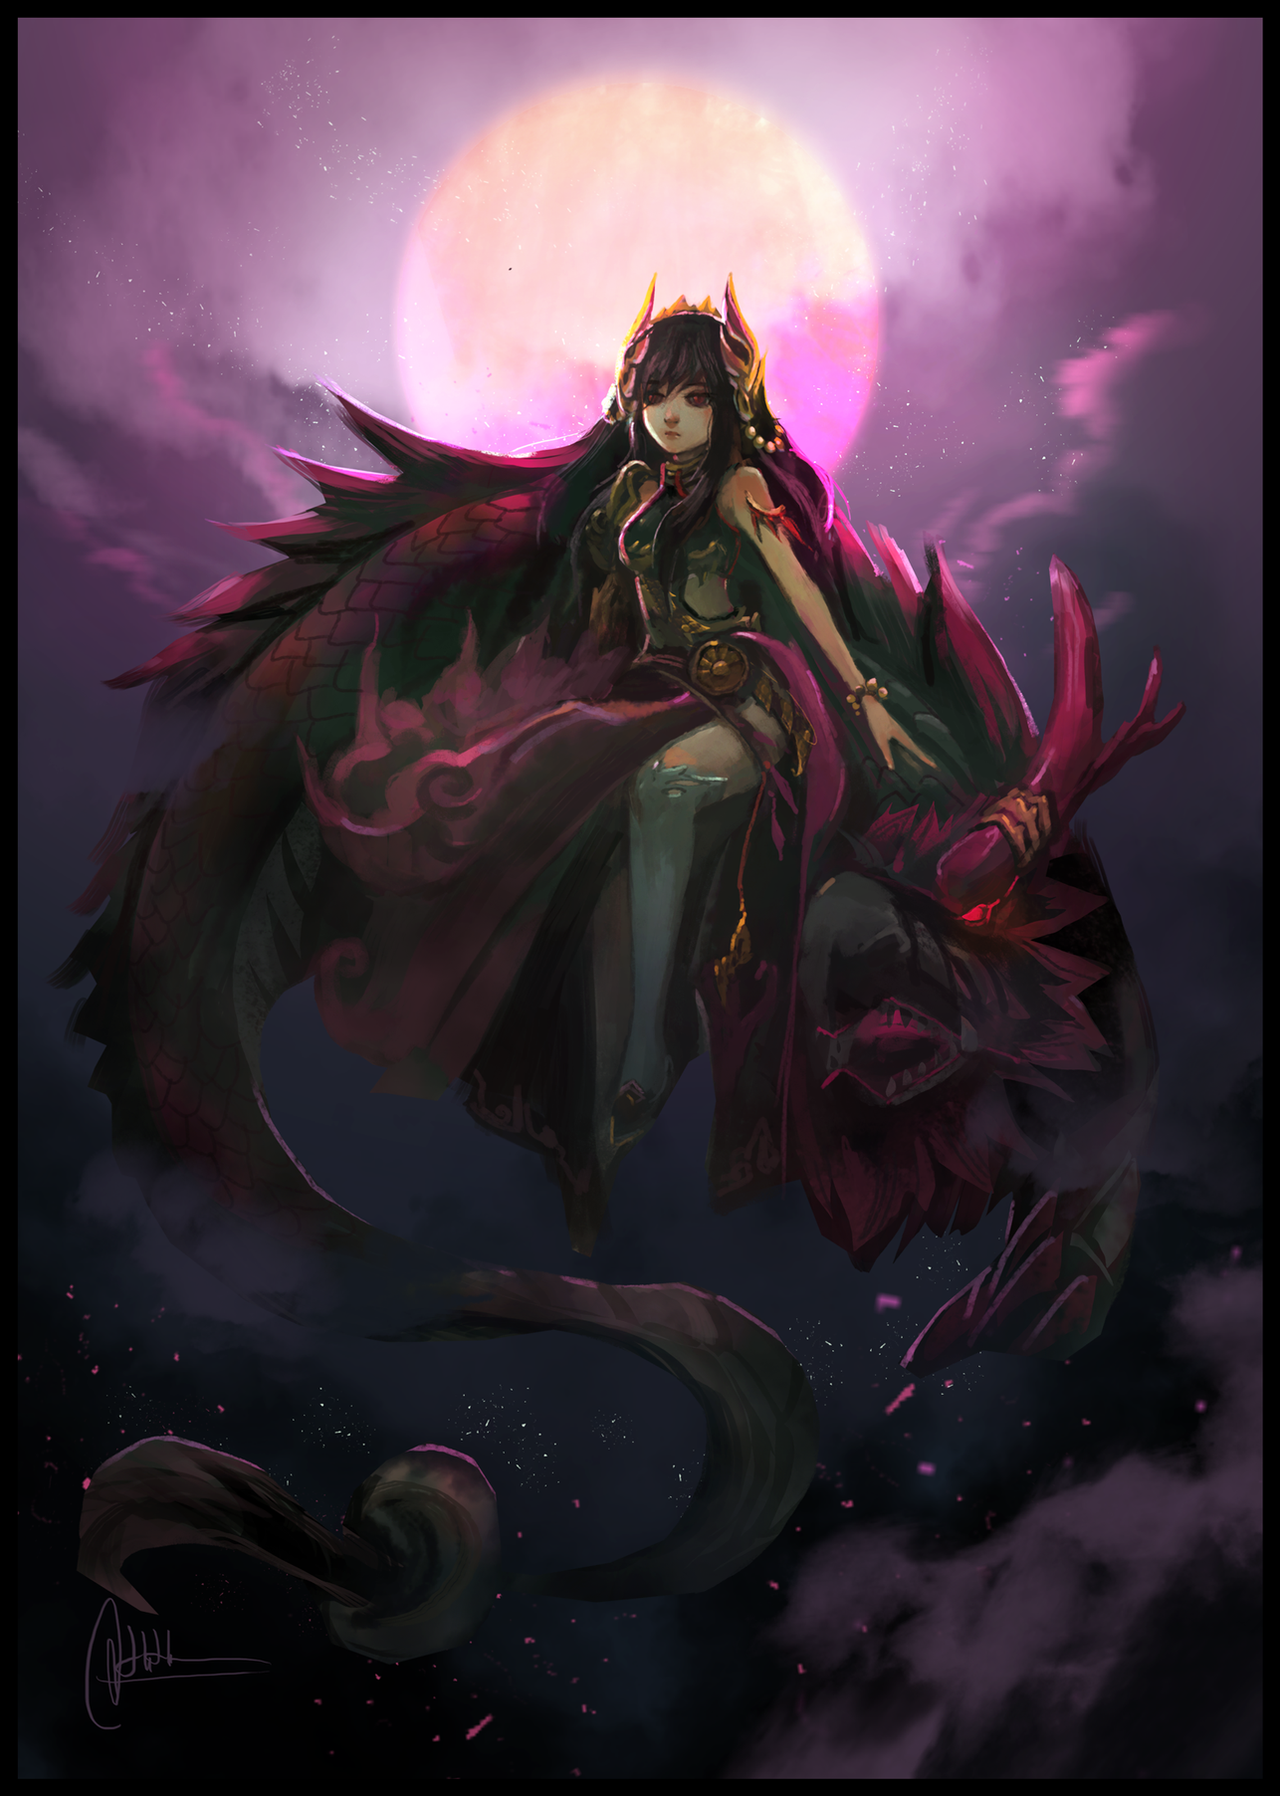 Rin fanart by dothaithanh